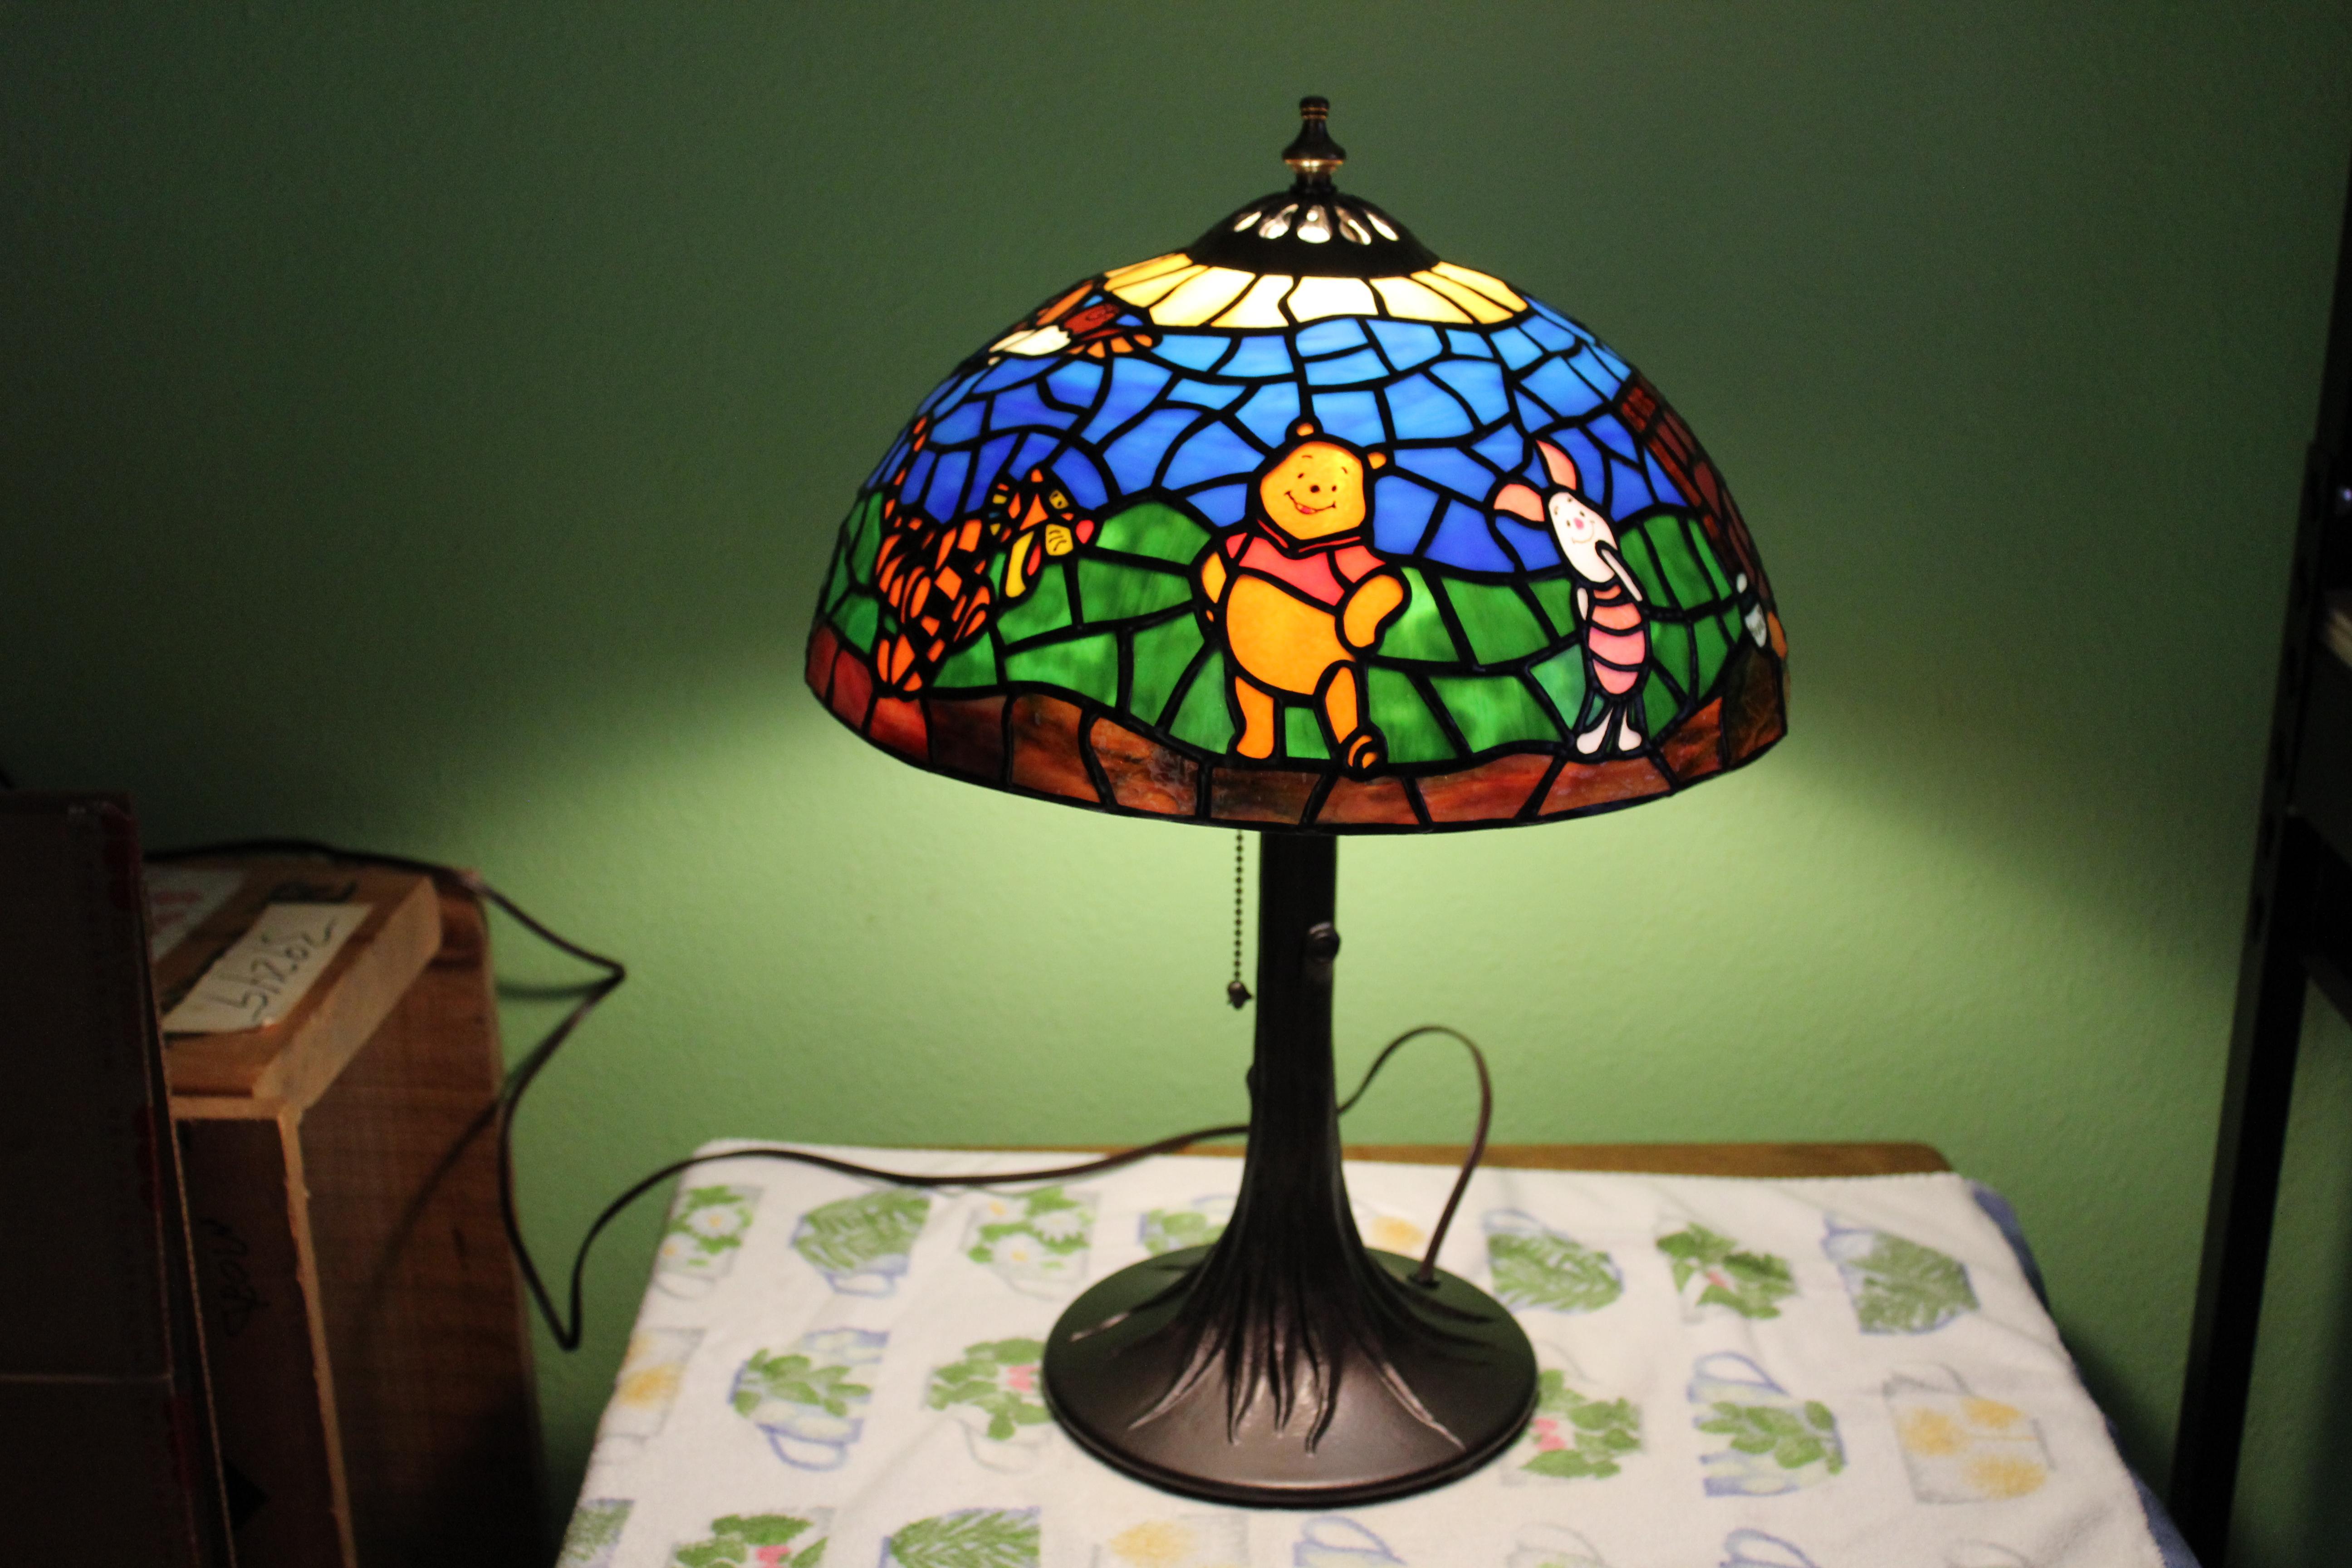 winnie pooh lampe 301 moved permanently disney winnie. Black Bedroom Furniture Sets. Home Design Ideas